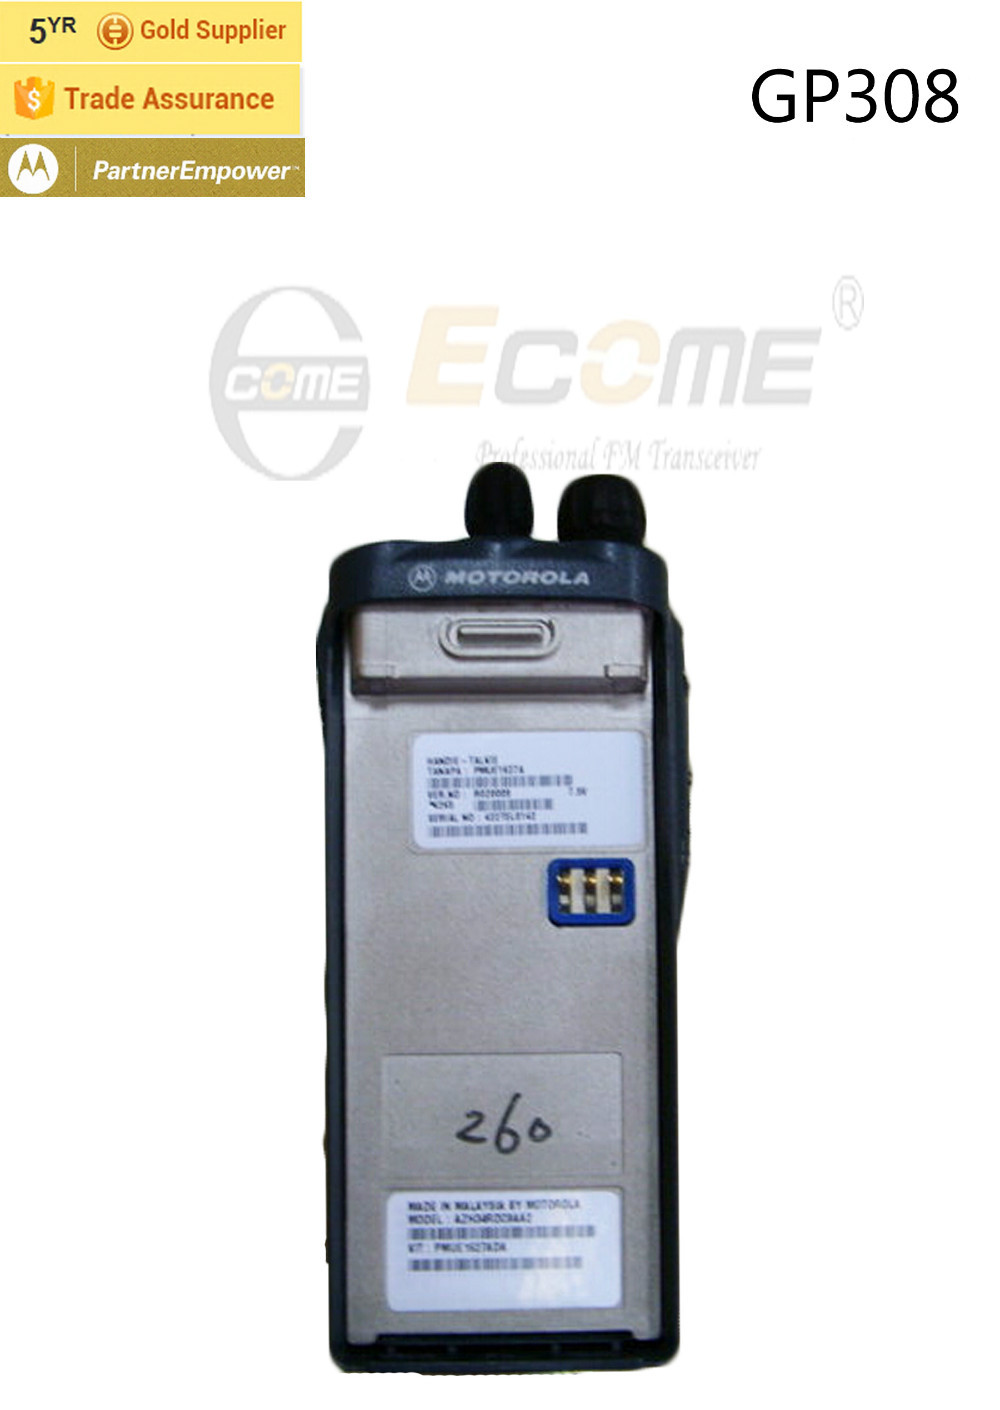 Motorola GP308 Portable Walkie Talkie -in Walkie Talkie from Cellphones &  Telecommunications on Aliexpress.com | Alibaba Group